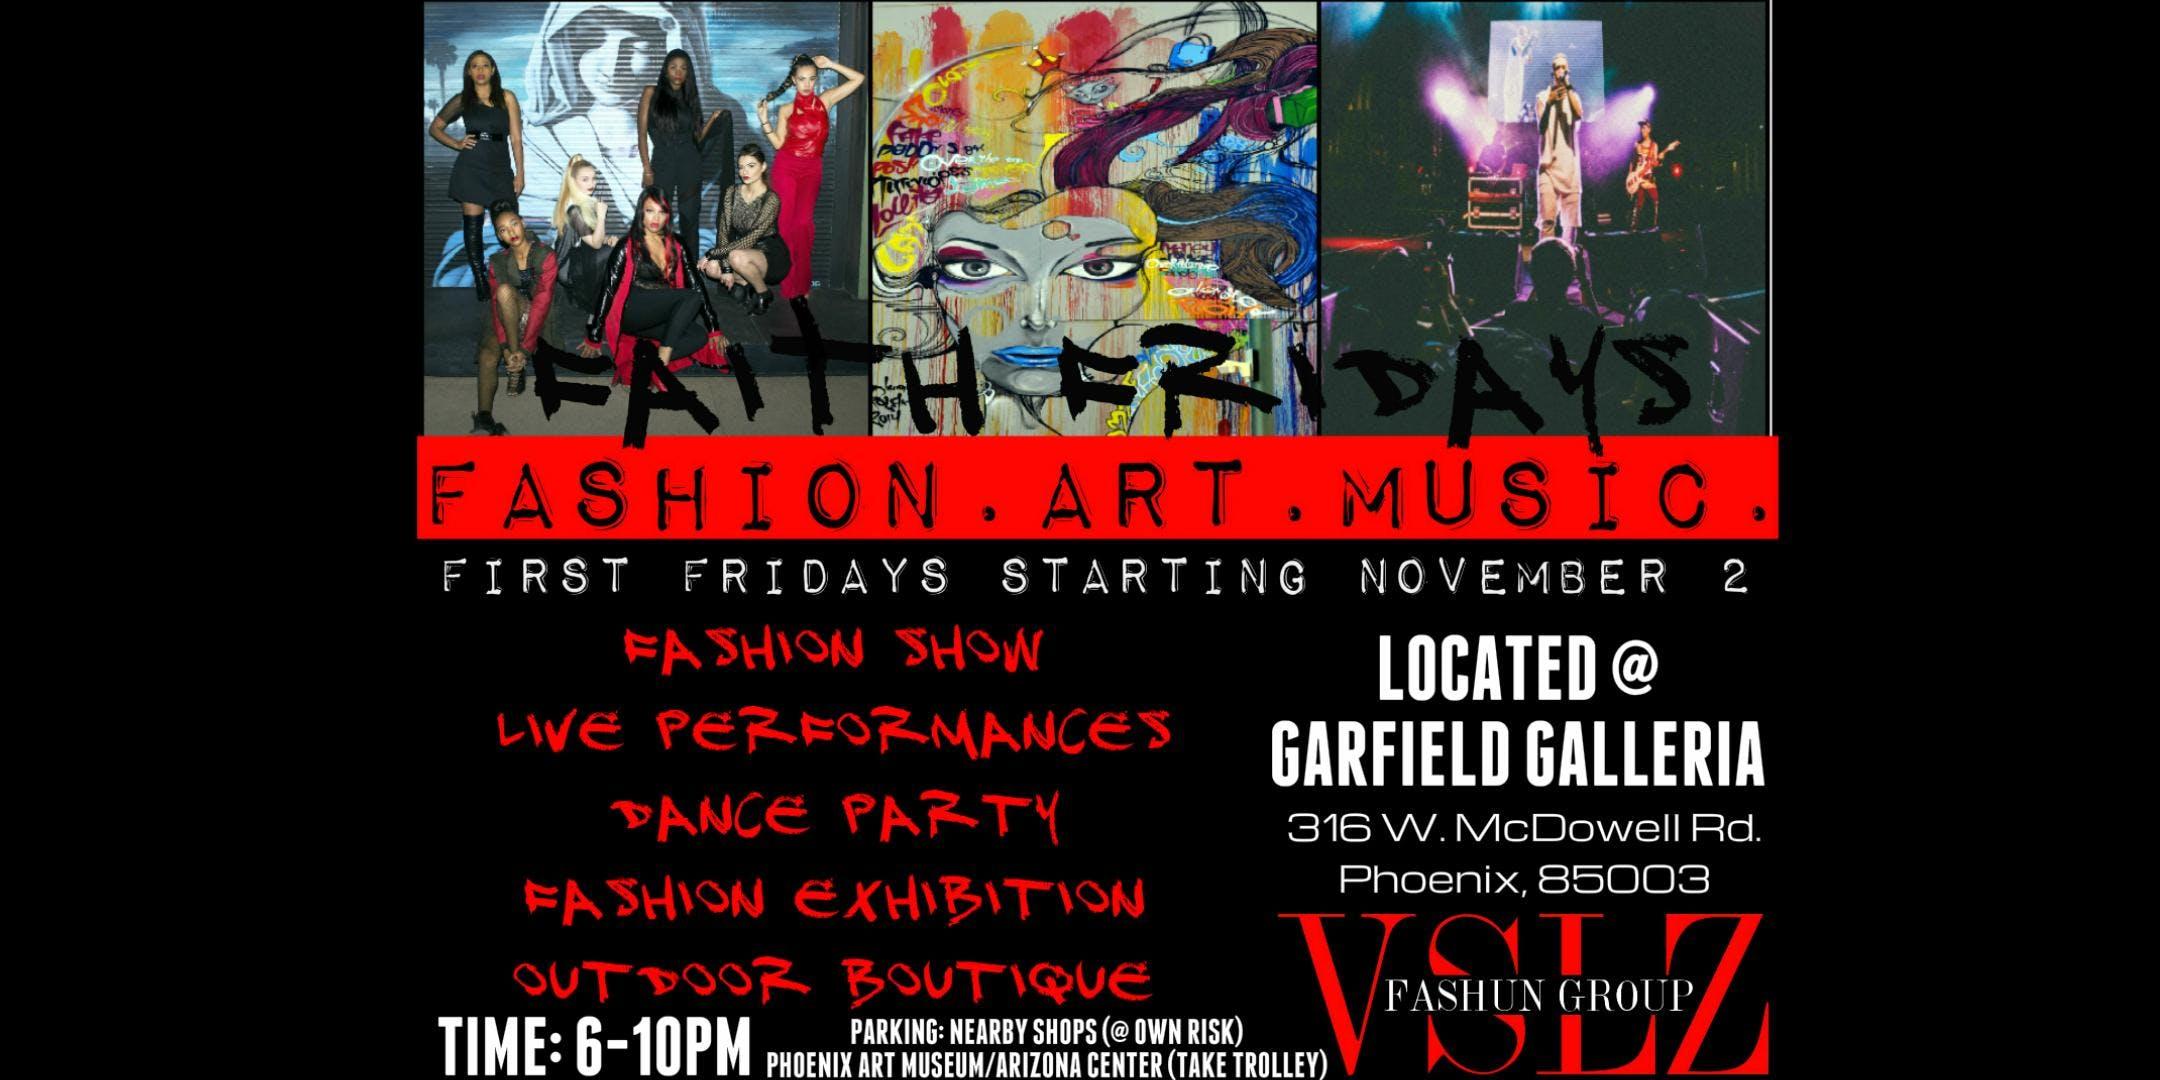 VSLZ: Fashion.Art.Music. (First Friday Event)